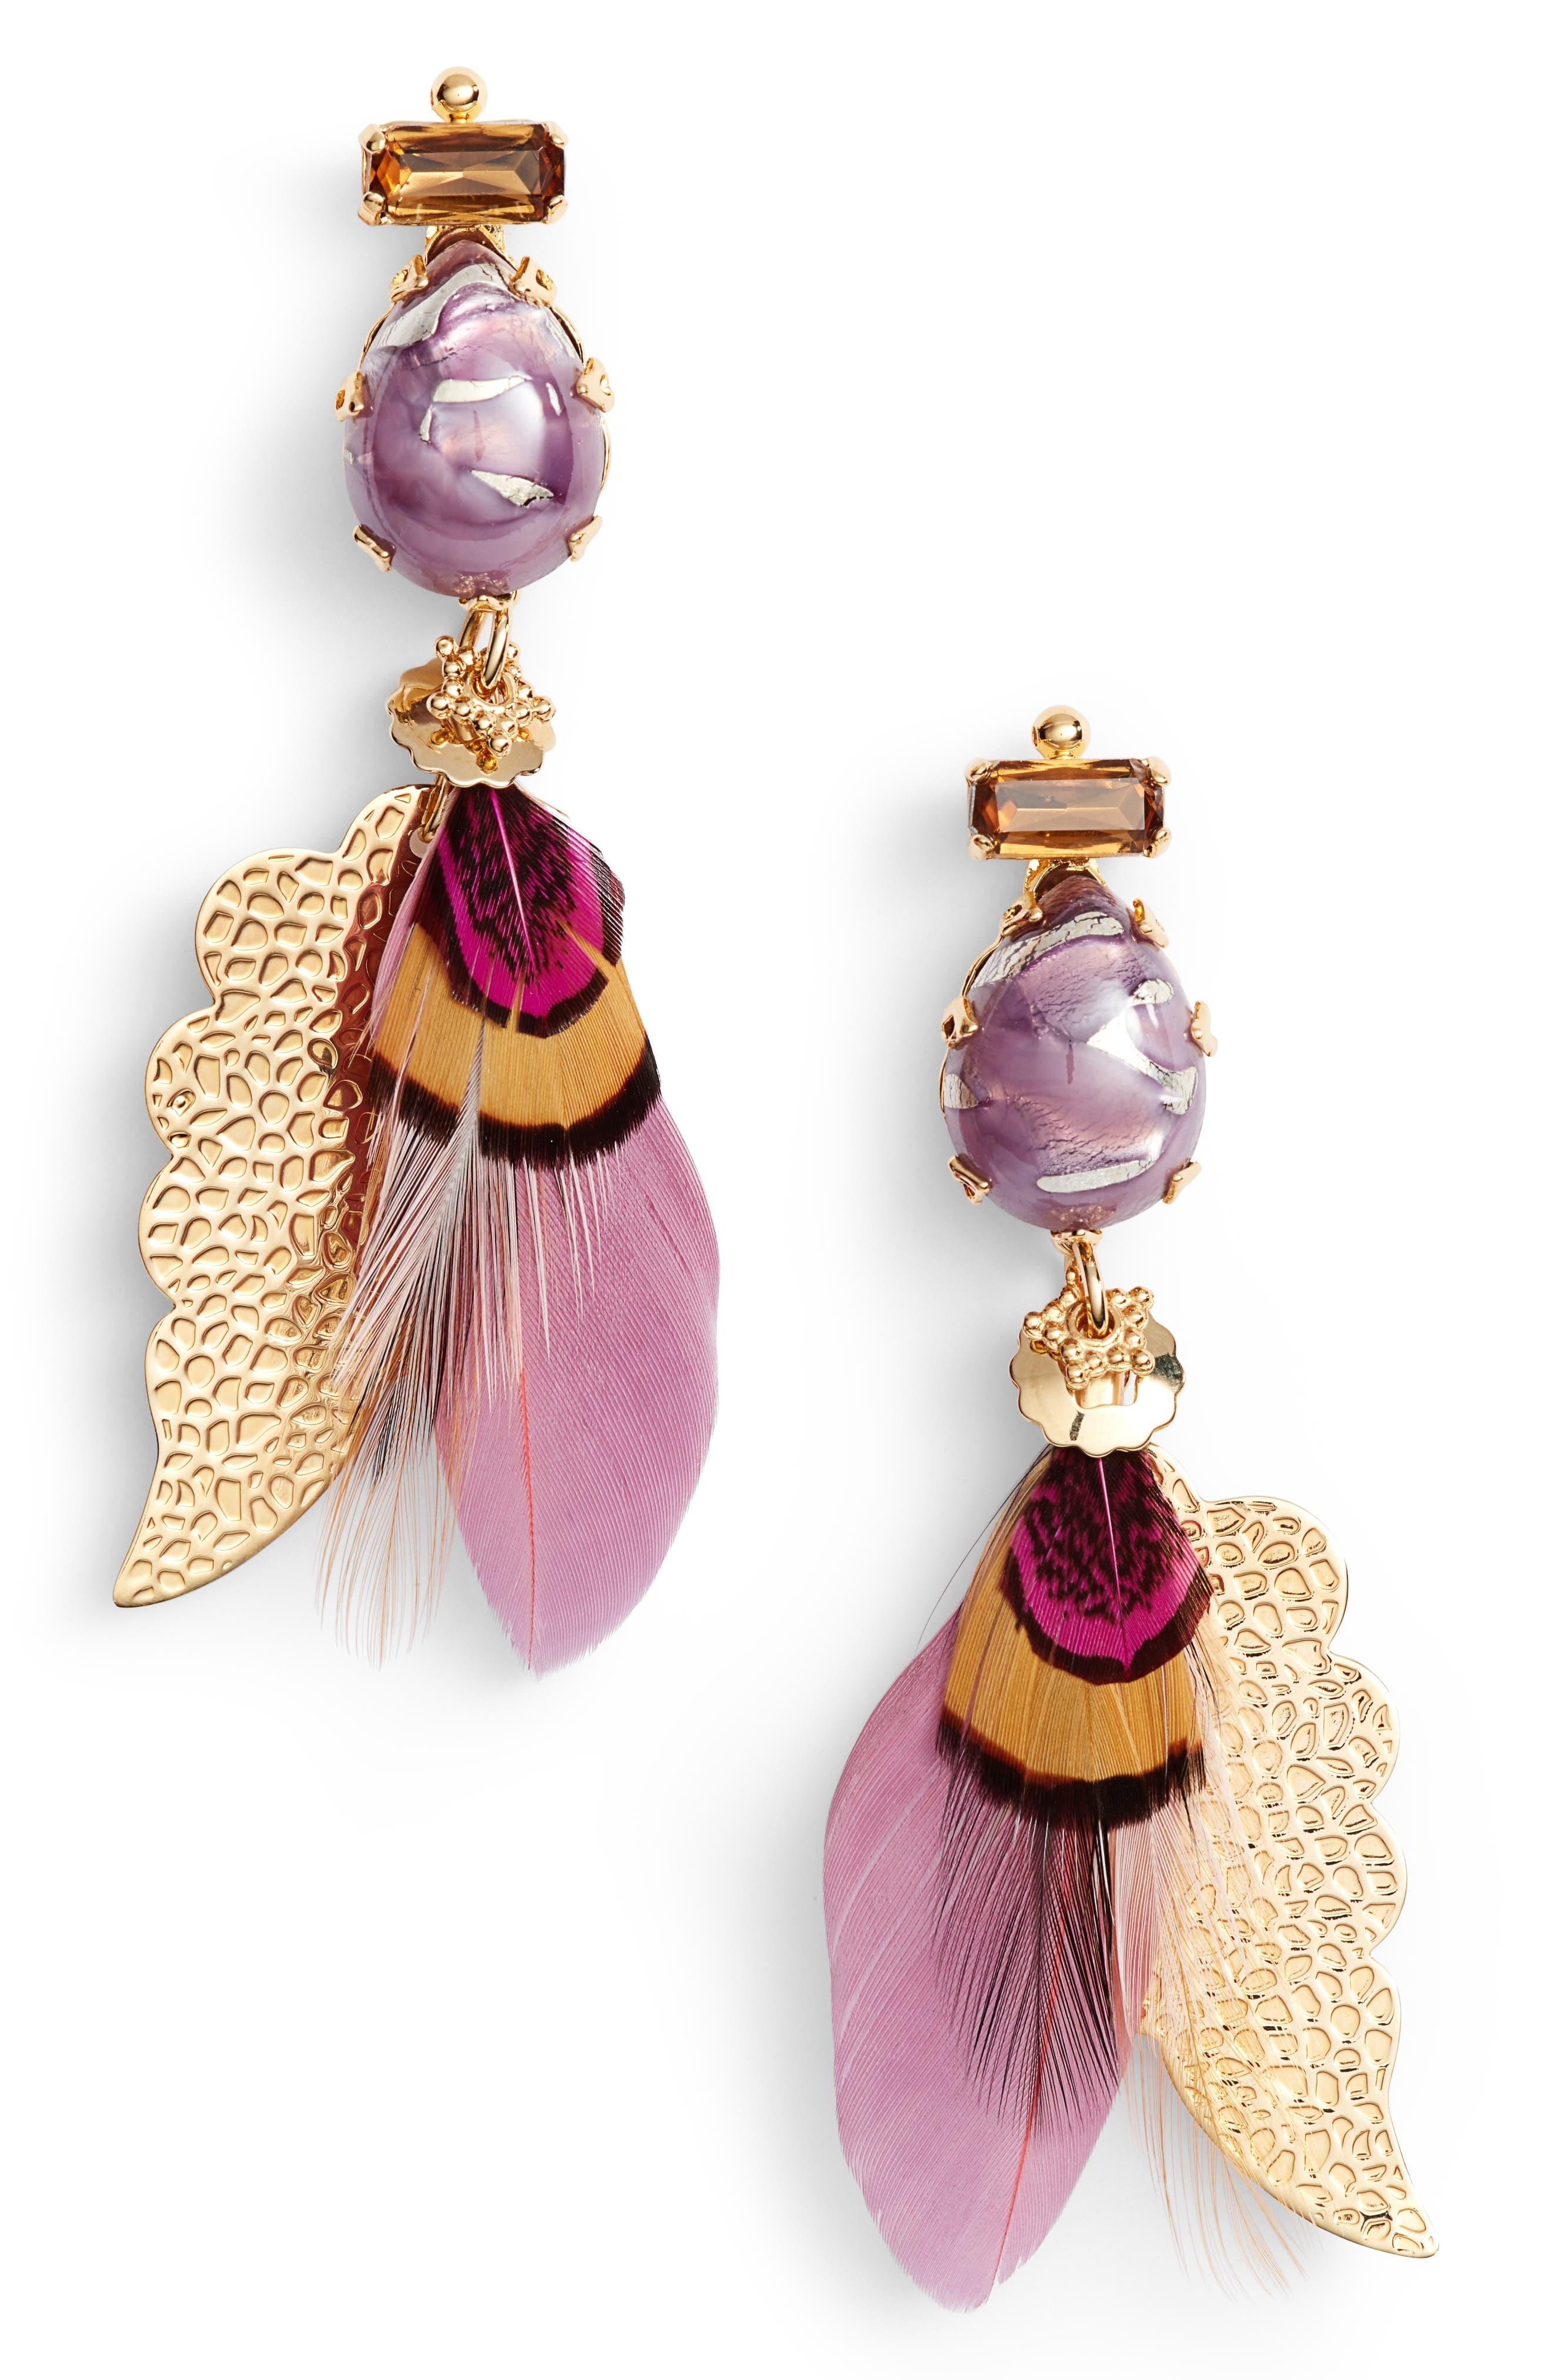 Irene Feather Drop Earrings,                             Main thumbnail 1, color,                             656